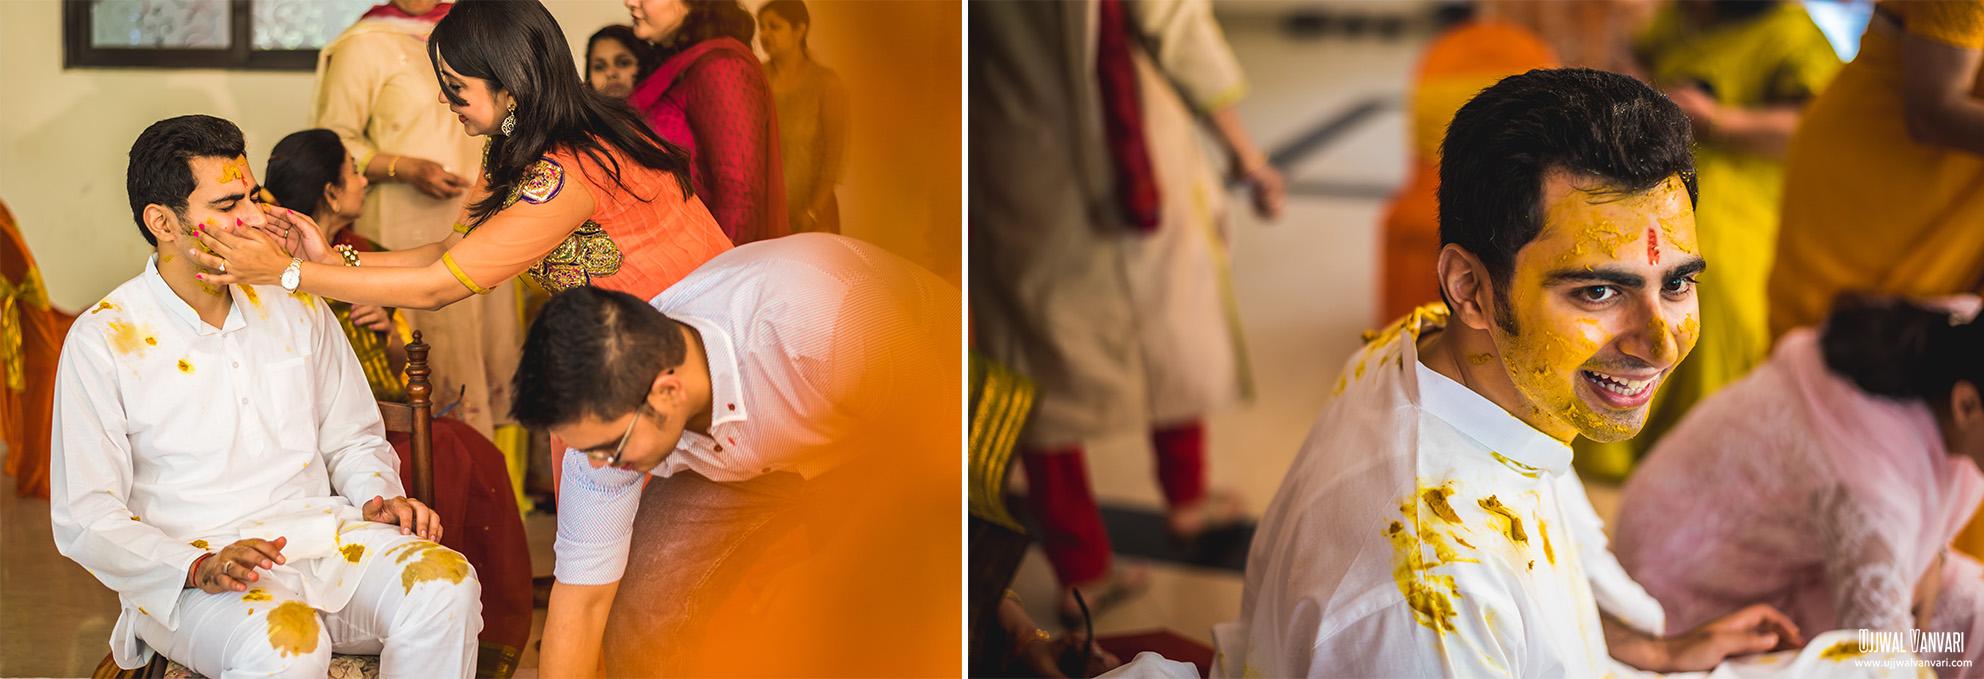 Wedding Photographer in Lucknow | Mannat & Rishabh Wedding | Best Wedding Photographer